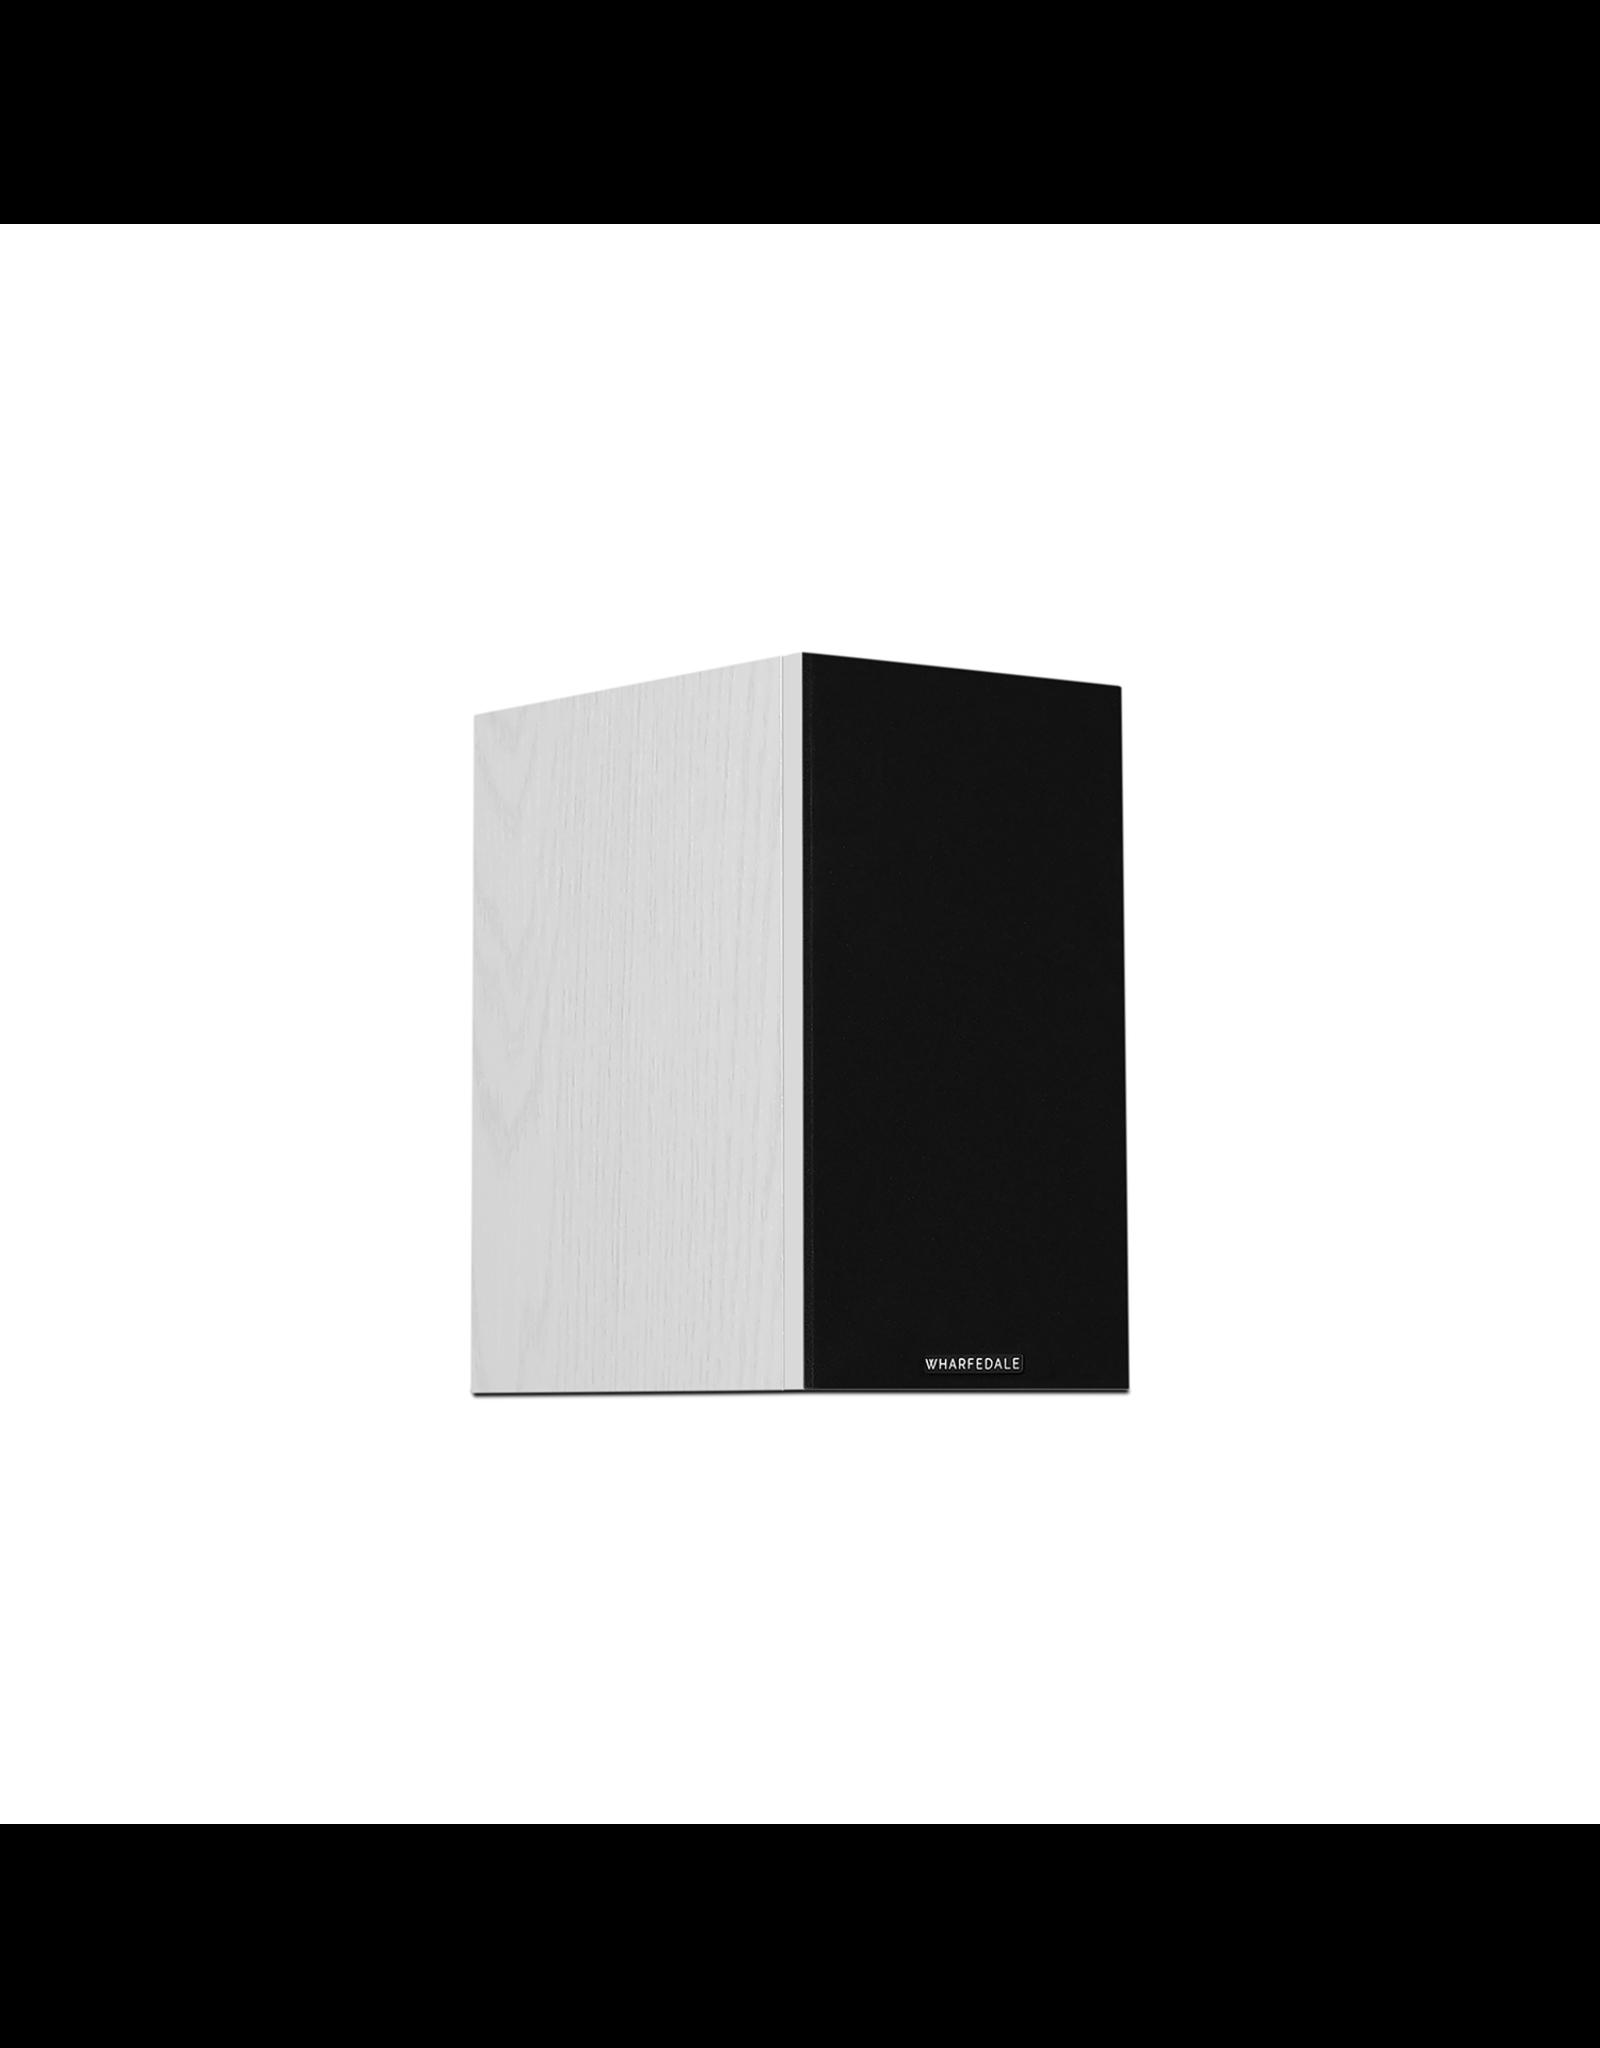 Wharfedale Wharfedale Diamond 12.2 Bookshelf Speakers